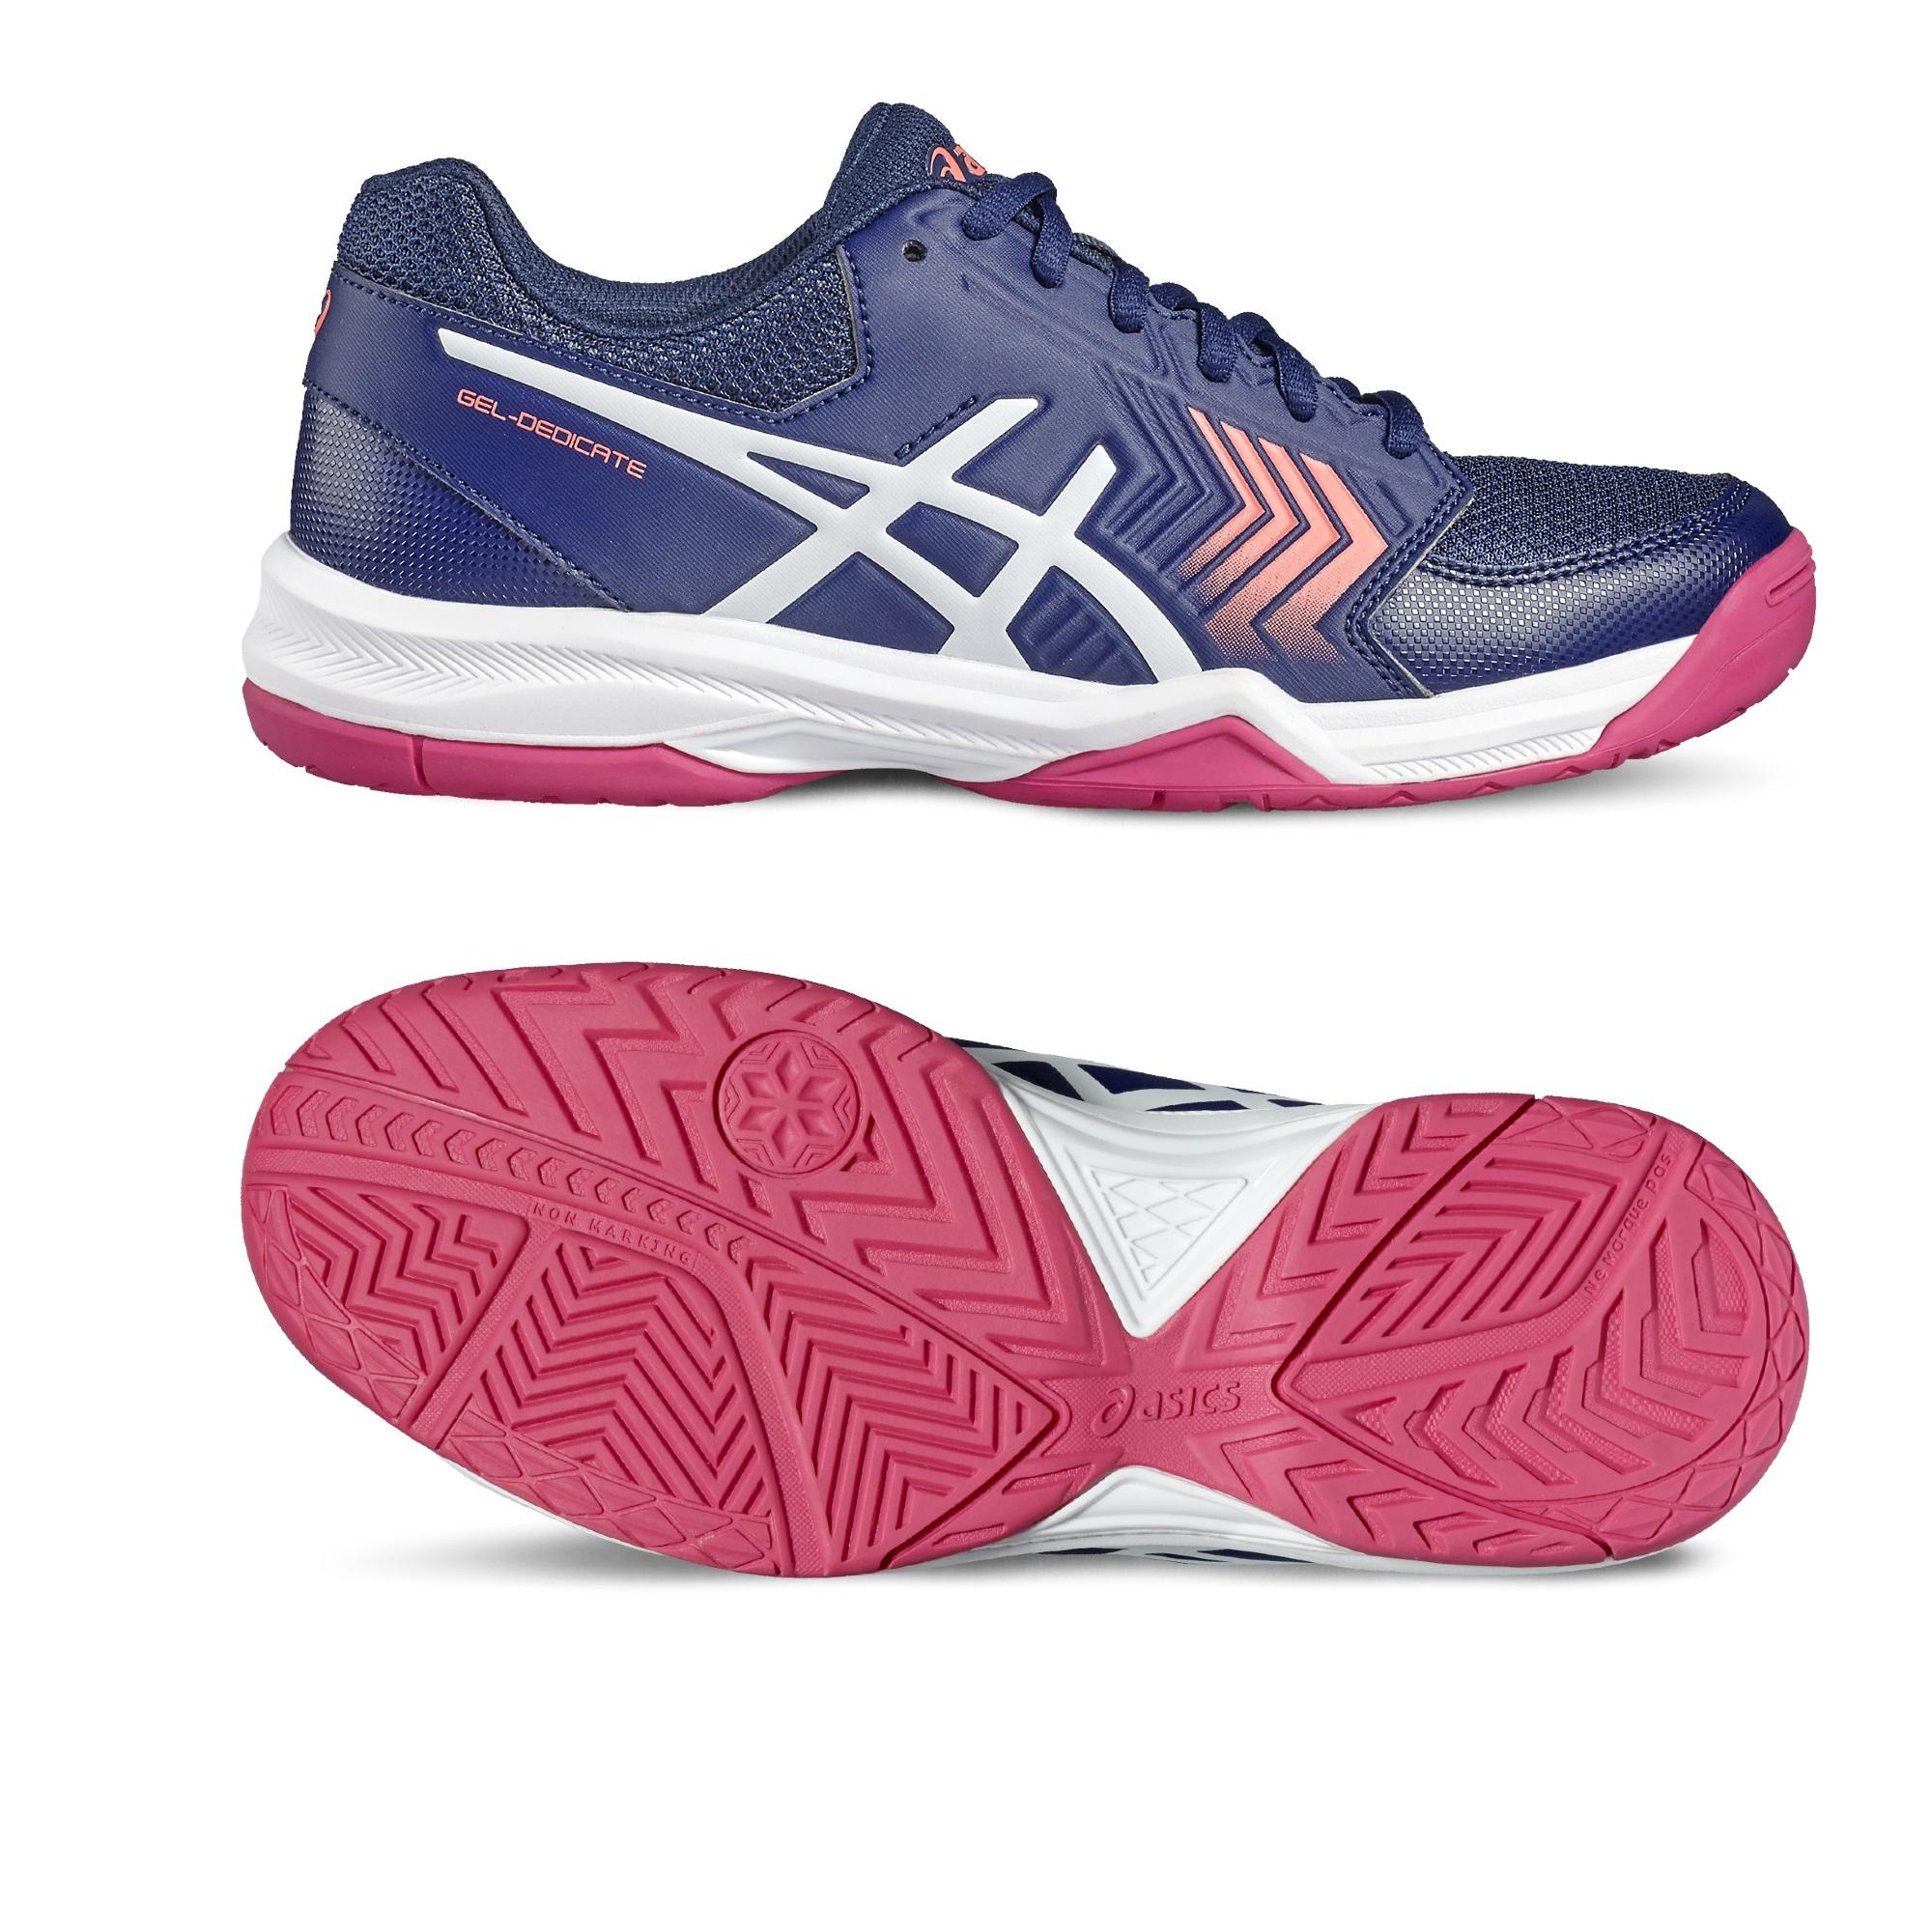 Asics GelDedicate 5 Ladies Tennis Shoes  BluePink 6.5 UK